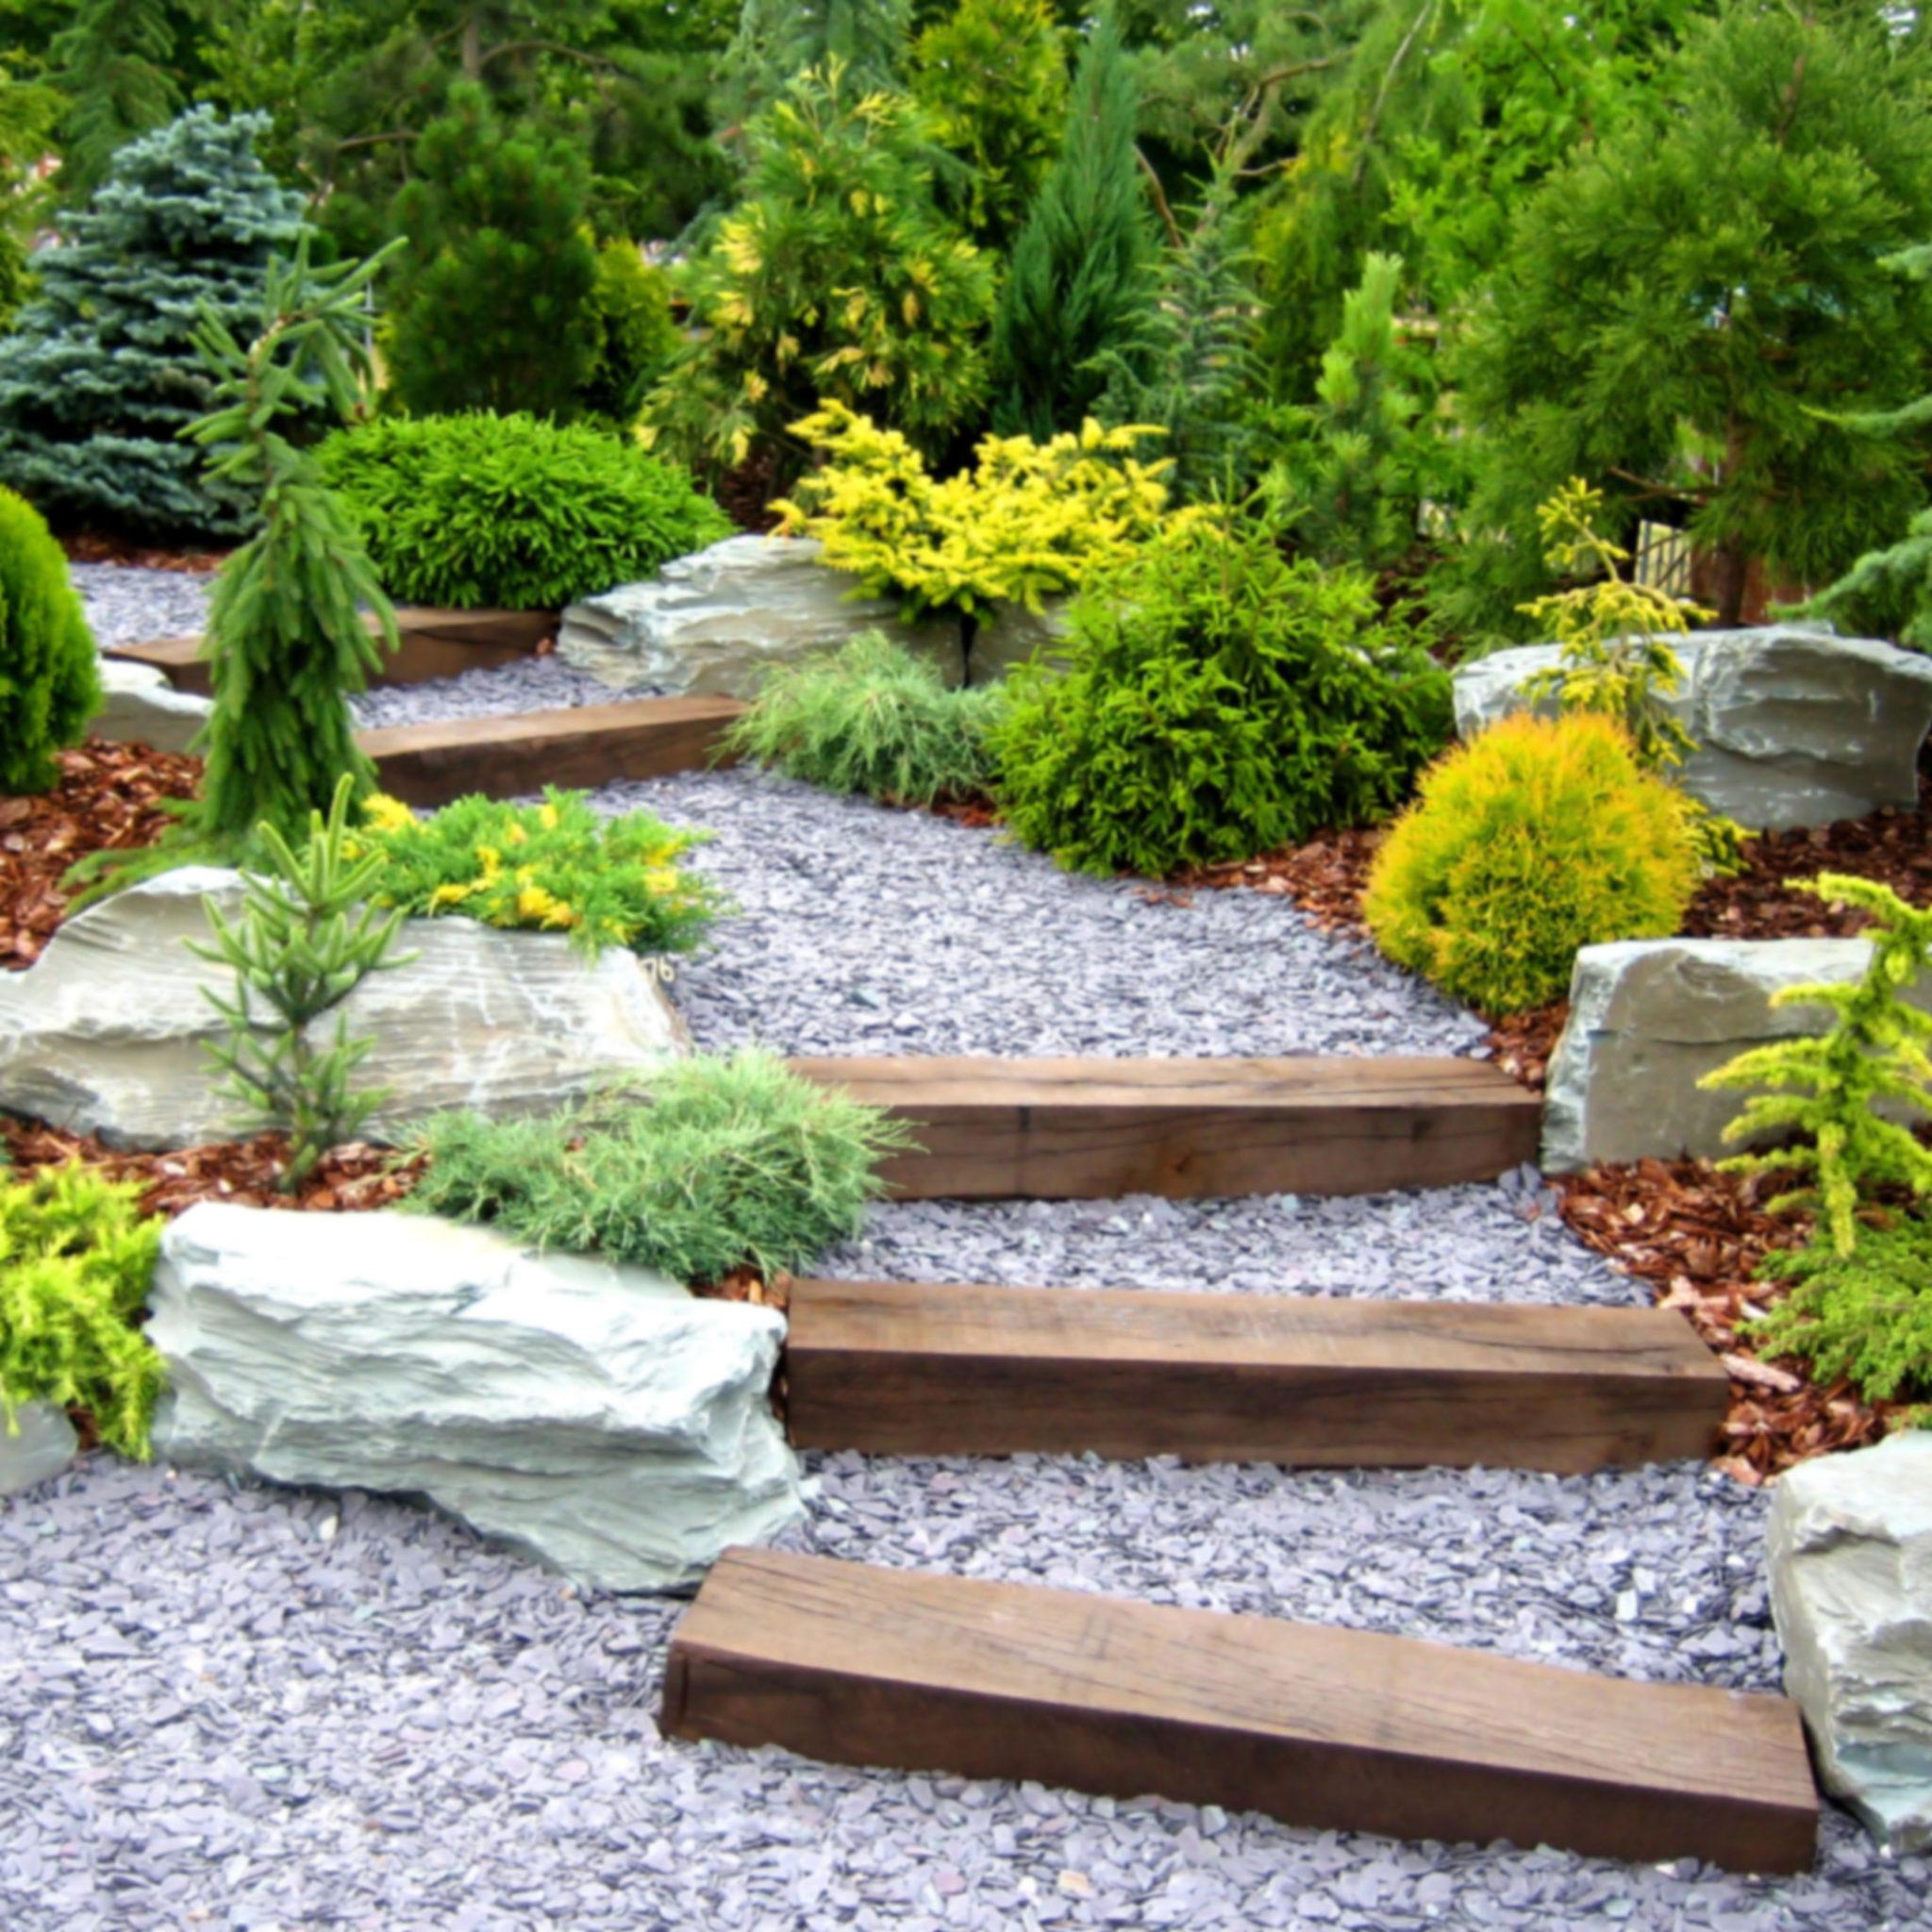 Spécialiste En Aménagement Paysager Boucherville | Jardin ... concernant Am2Nagement Jardin